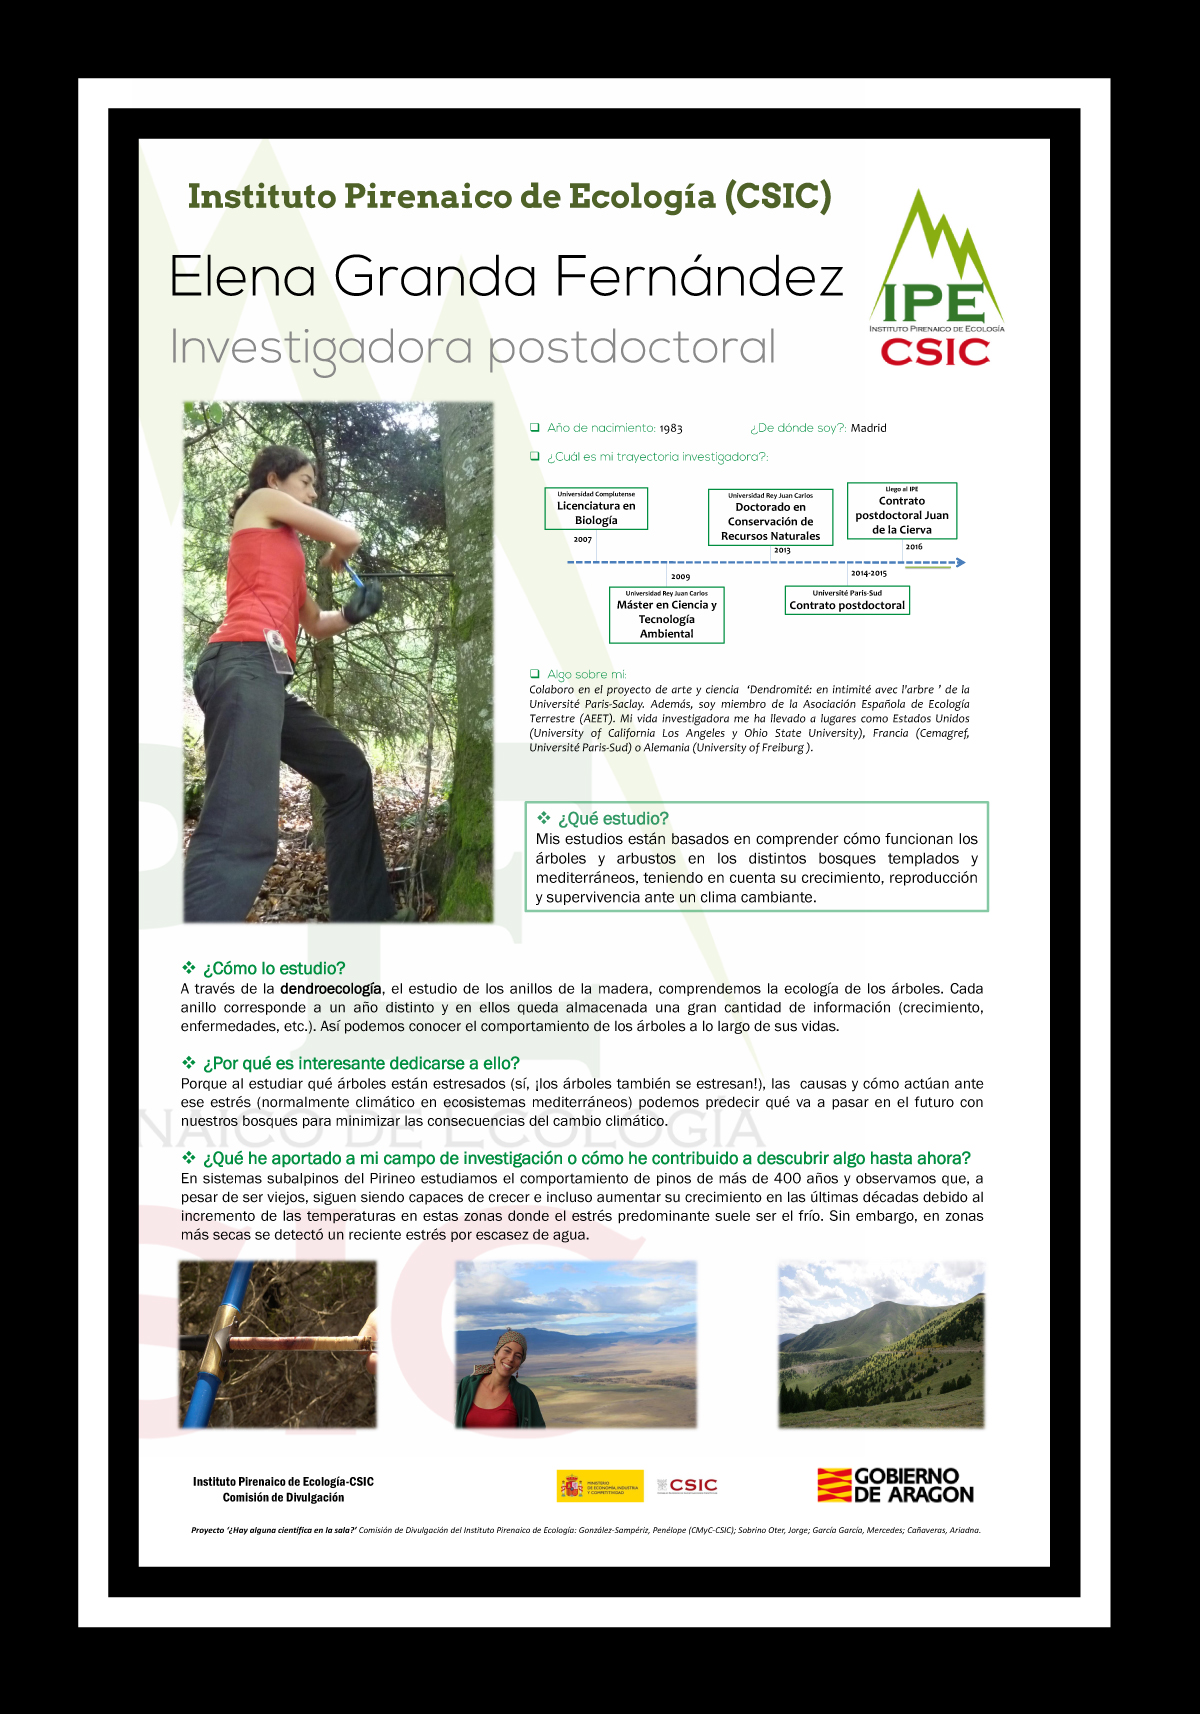 Elena Granda Fernández